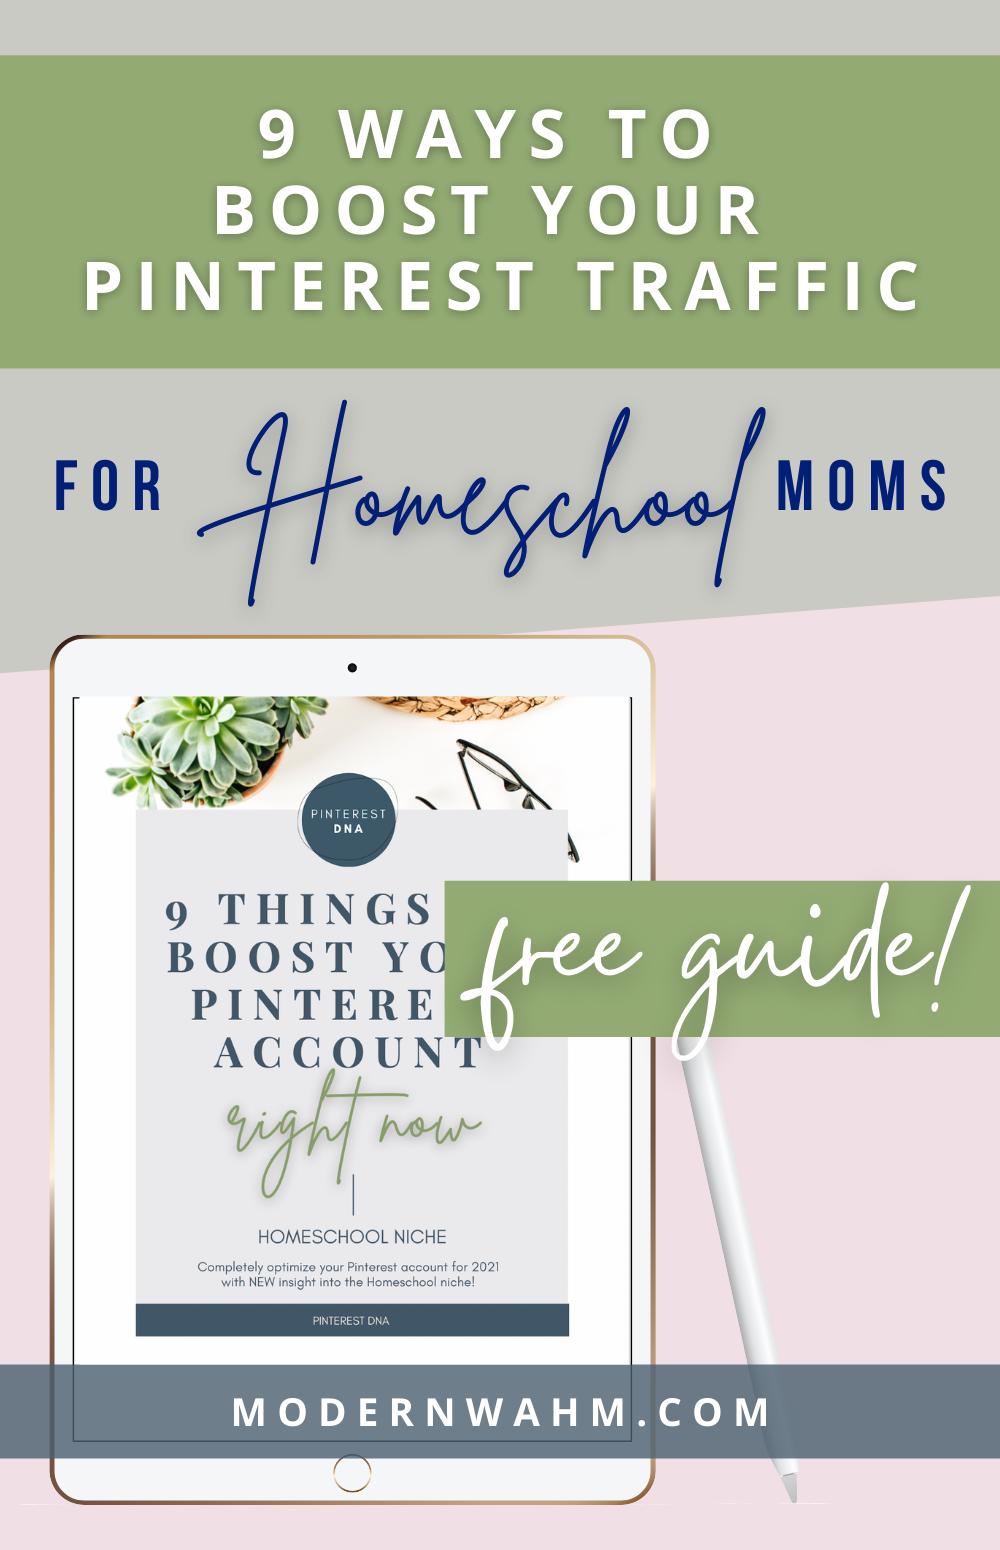 Pinterest DNA Resources for the Homeschool Niche